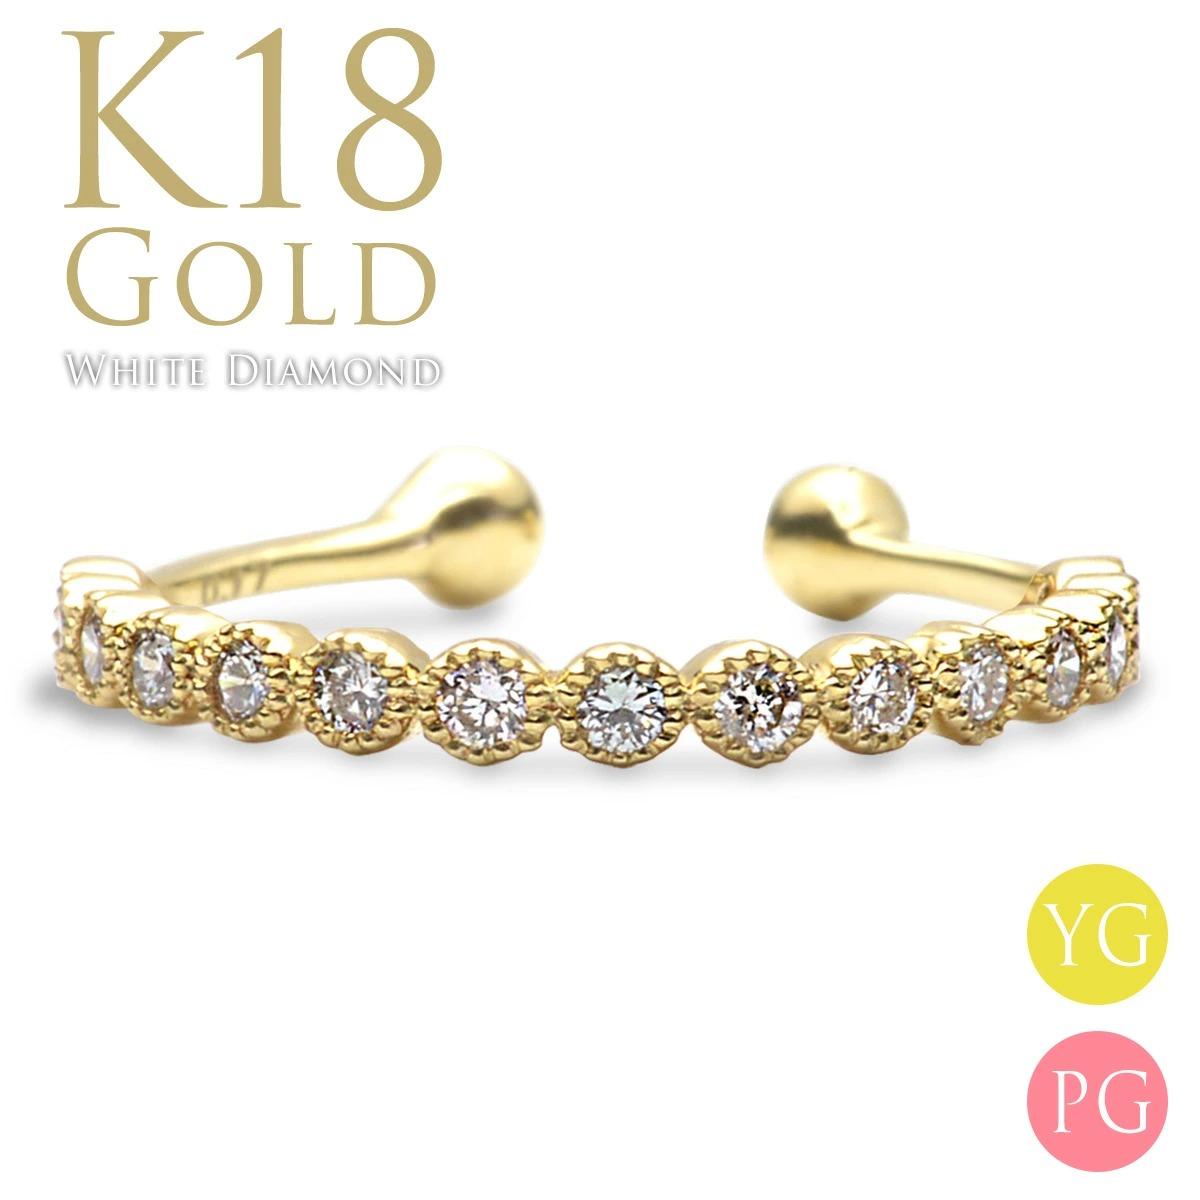 K18 ゴールド ホワイトダイヤモンド  ミルグレイン イヤーカフ (片耳用) RERALUy rer1658k18 新作